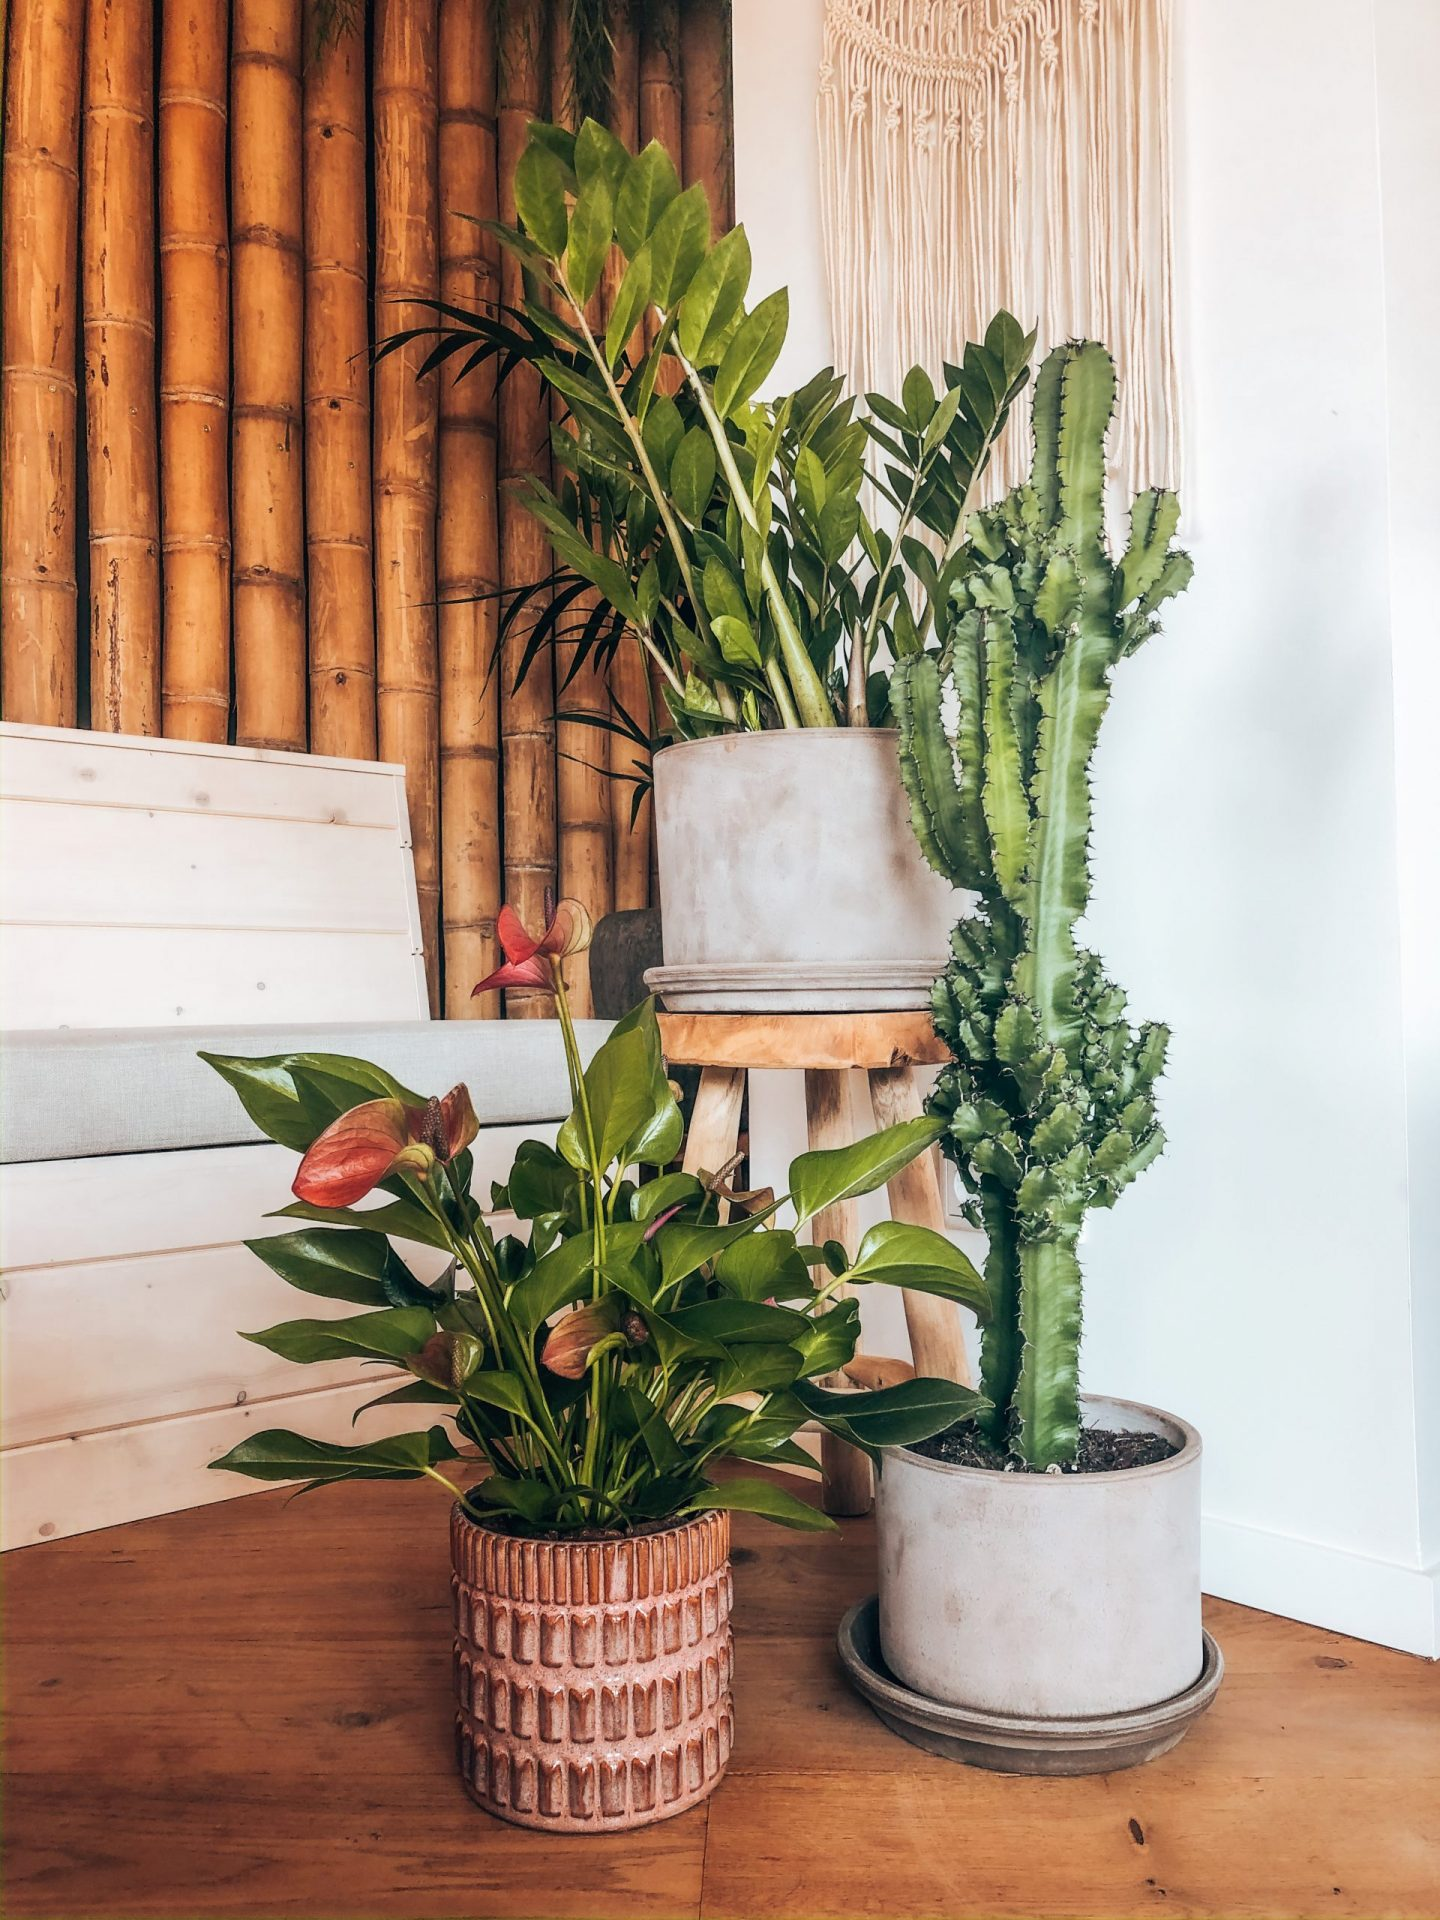 planten, plant, groen, inrichting, gezelligheid, warmte, bamboe, poef, poefjes, pouf, xmariekie, blogger, tips, interieur